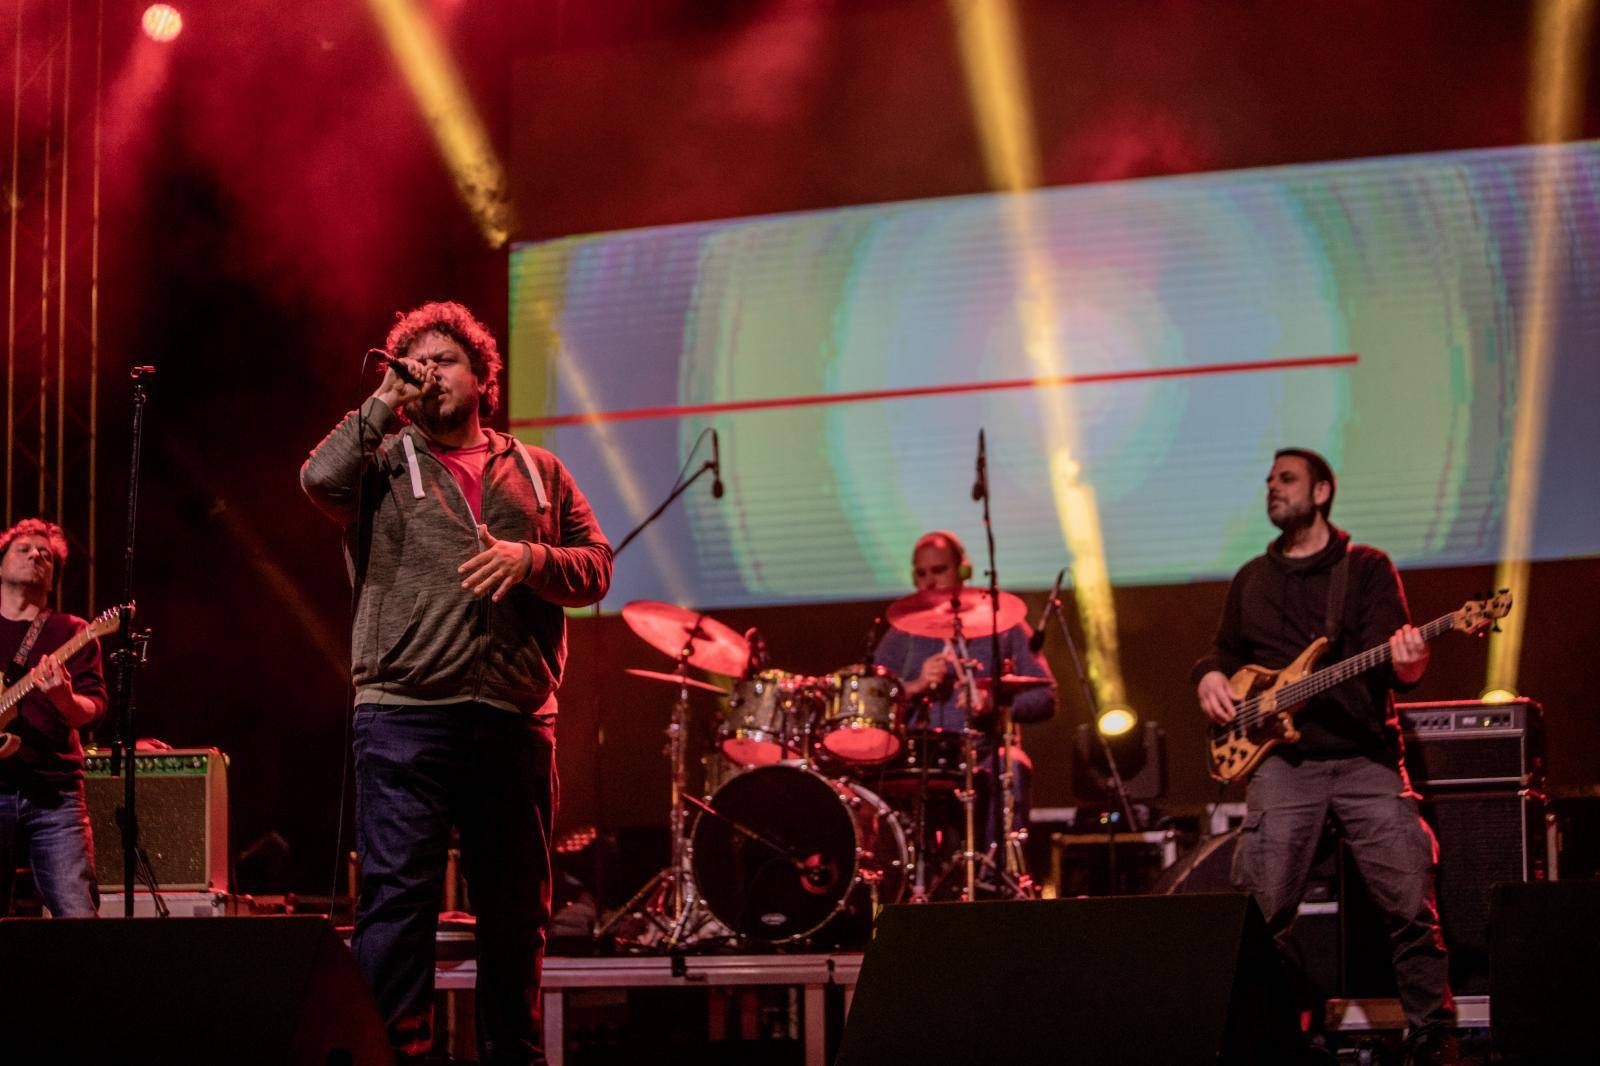 Provod na Chill&Grillu: TBF je 'zapalio' publiku koncertom...